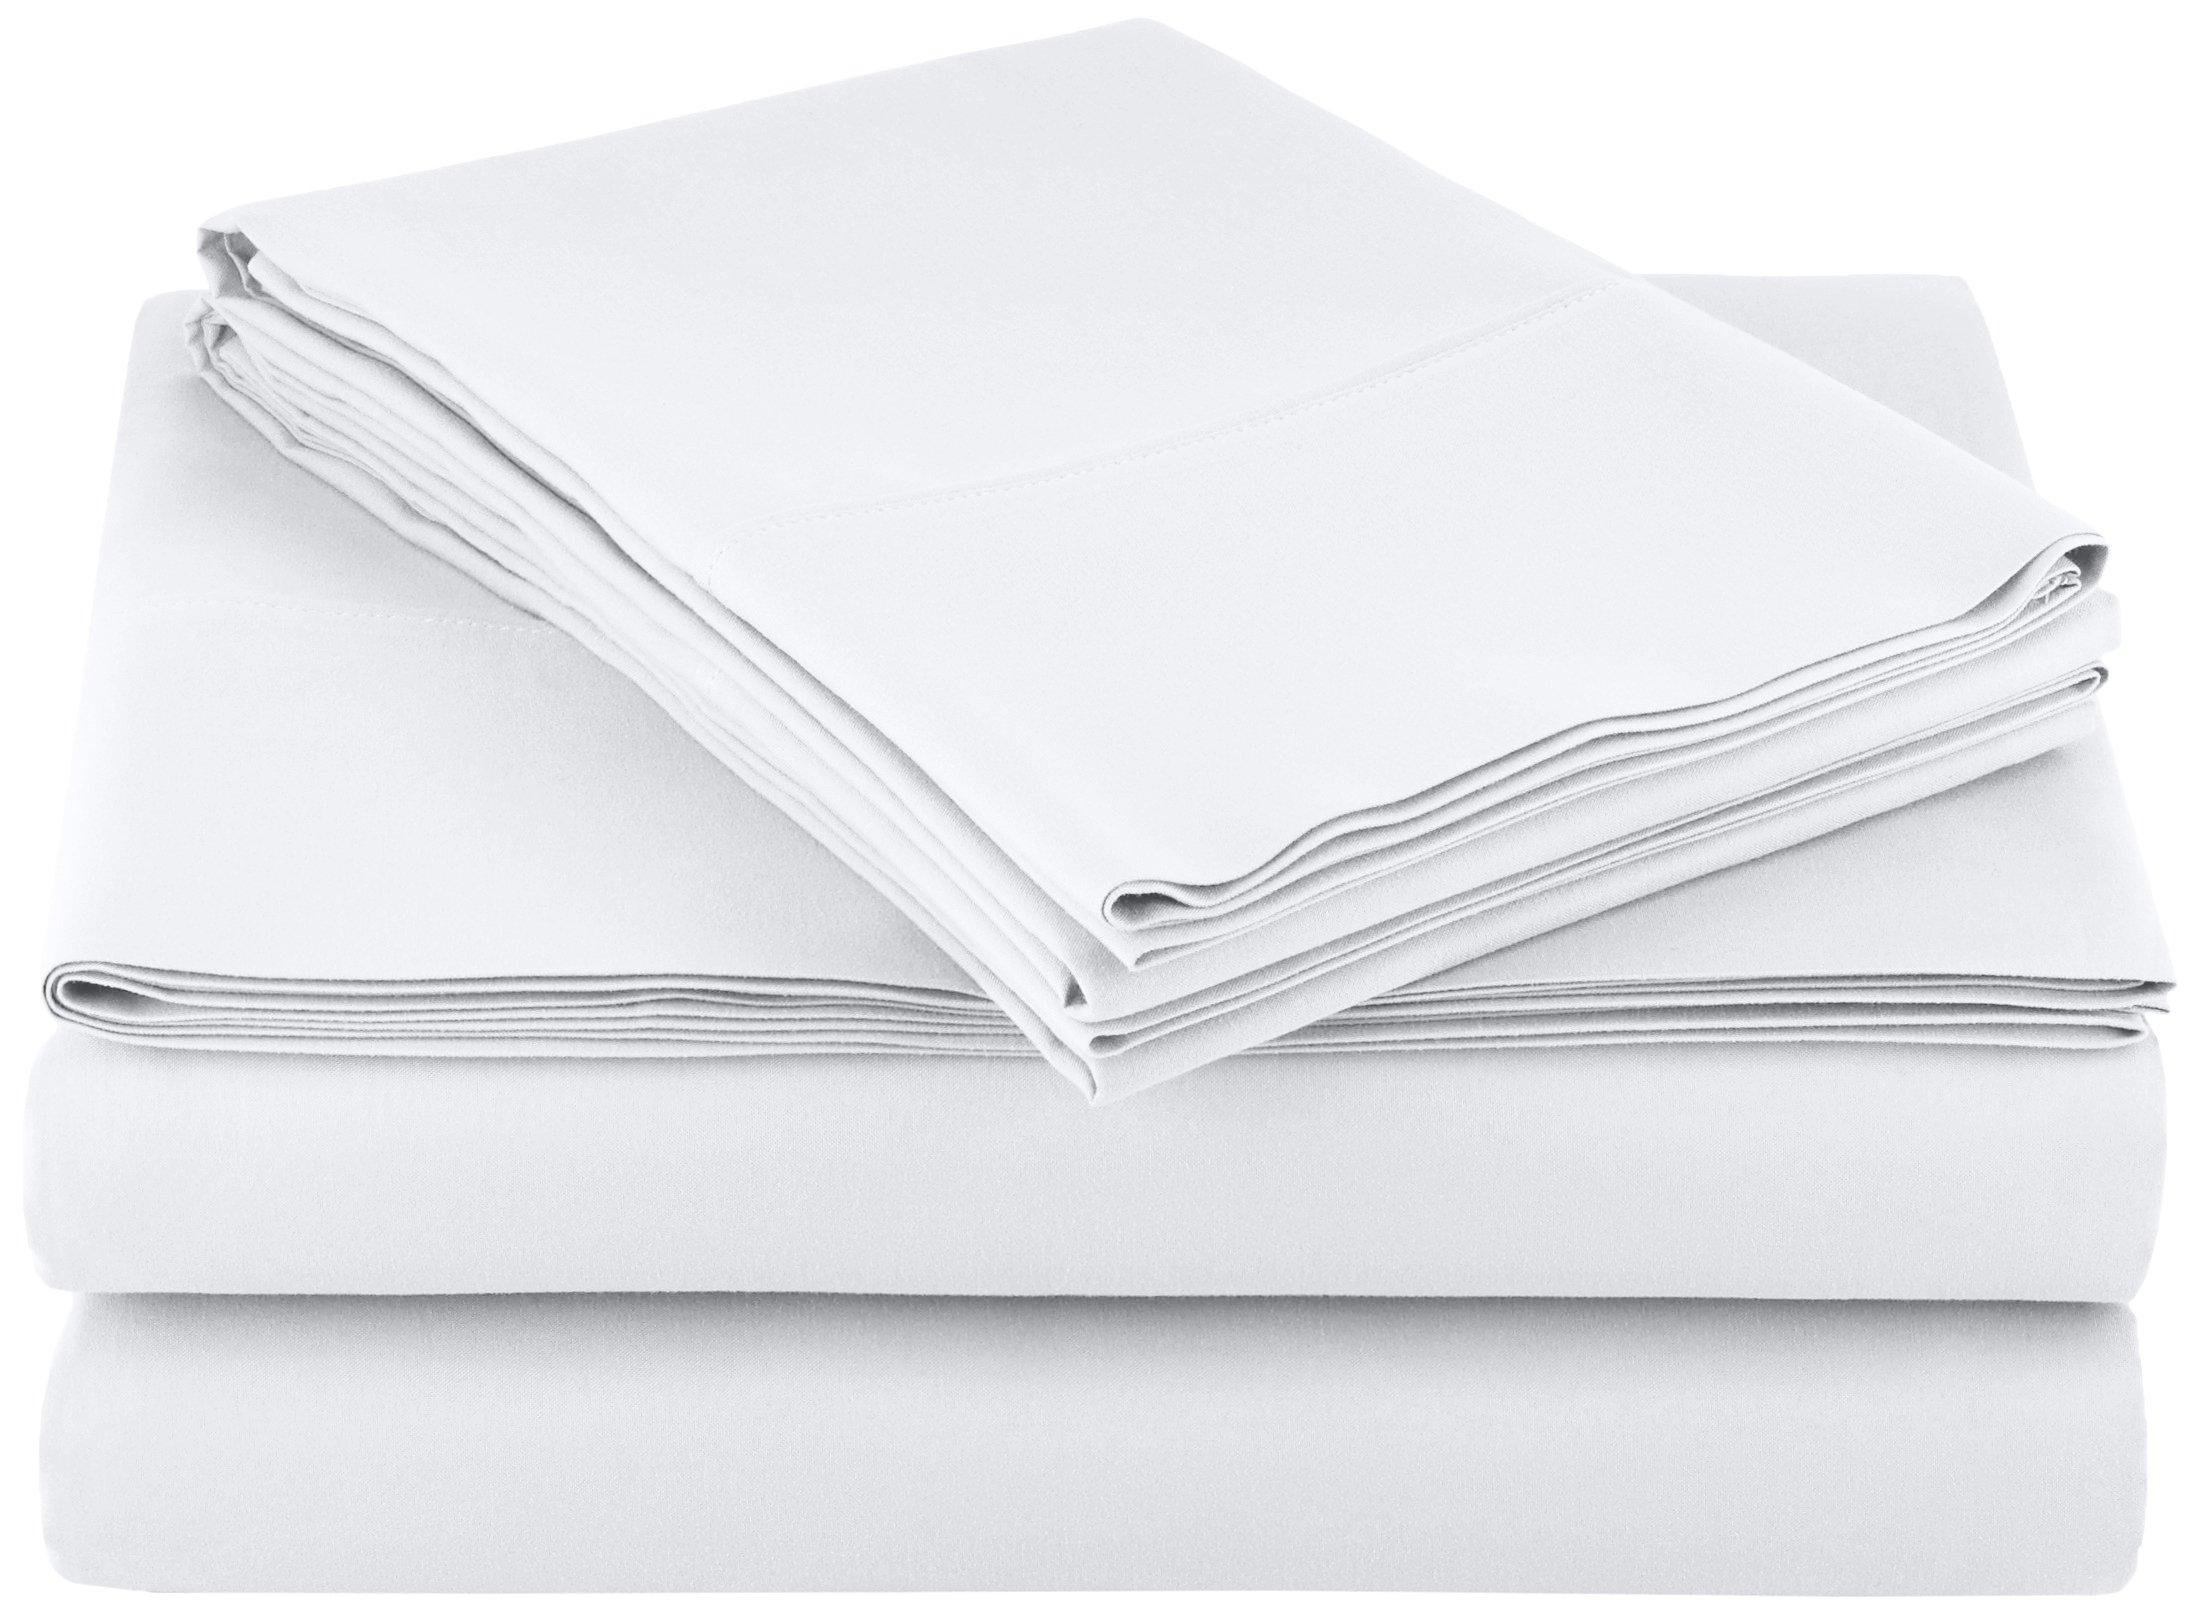 AmazonBasics Light-Weight Microfiber Sheet Set, King, Bright White by AmazonBasics